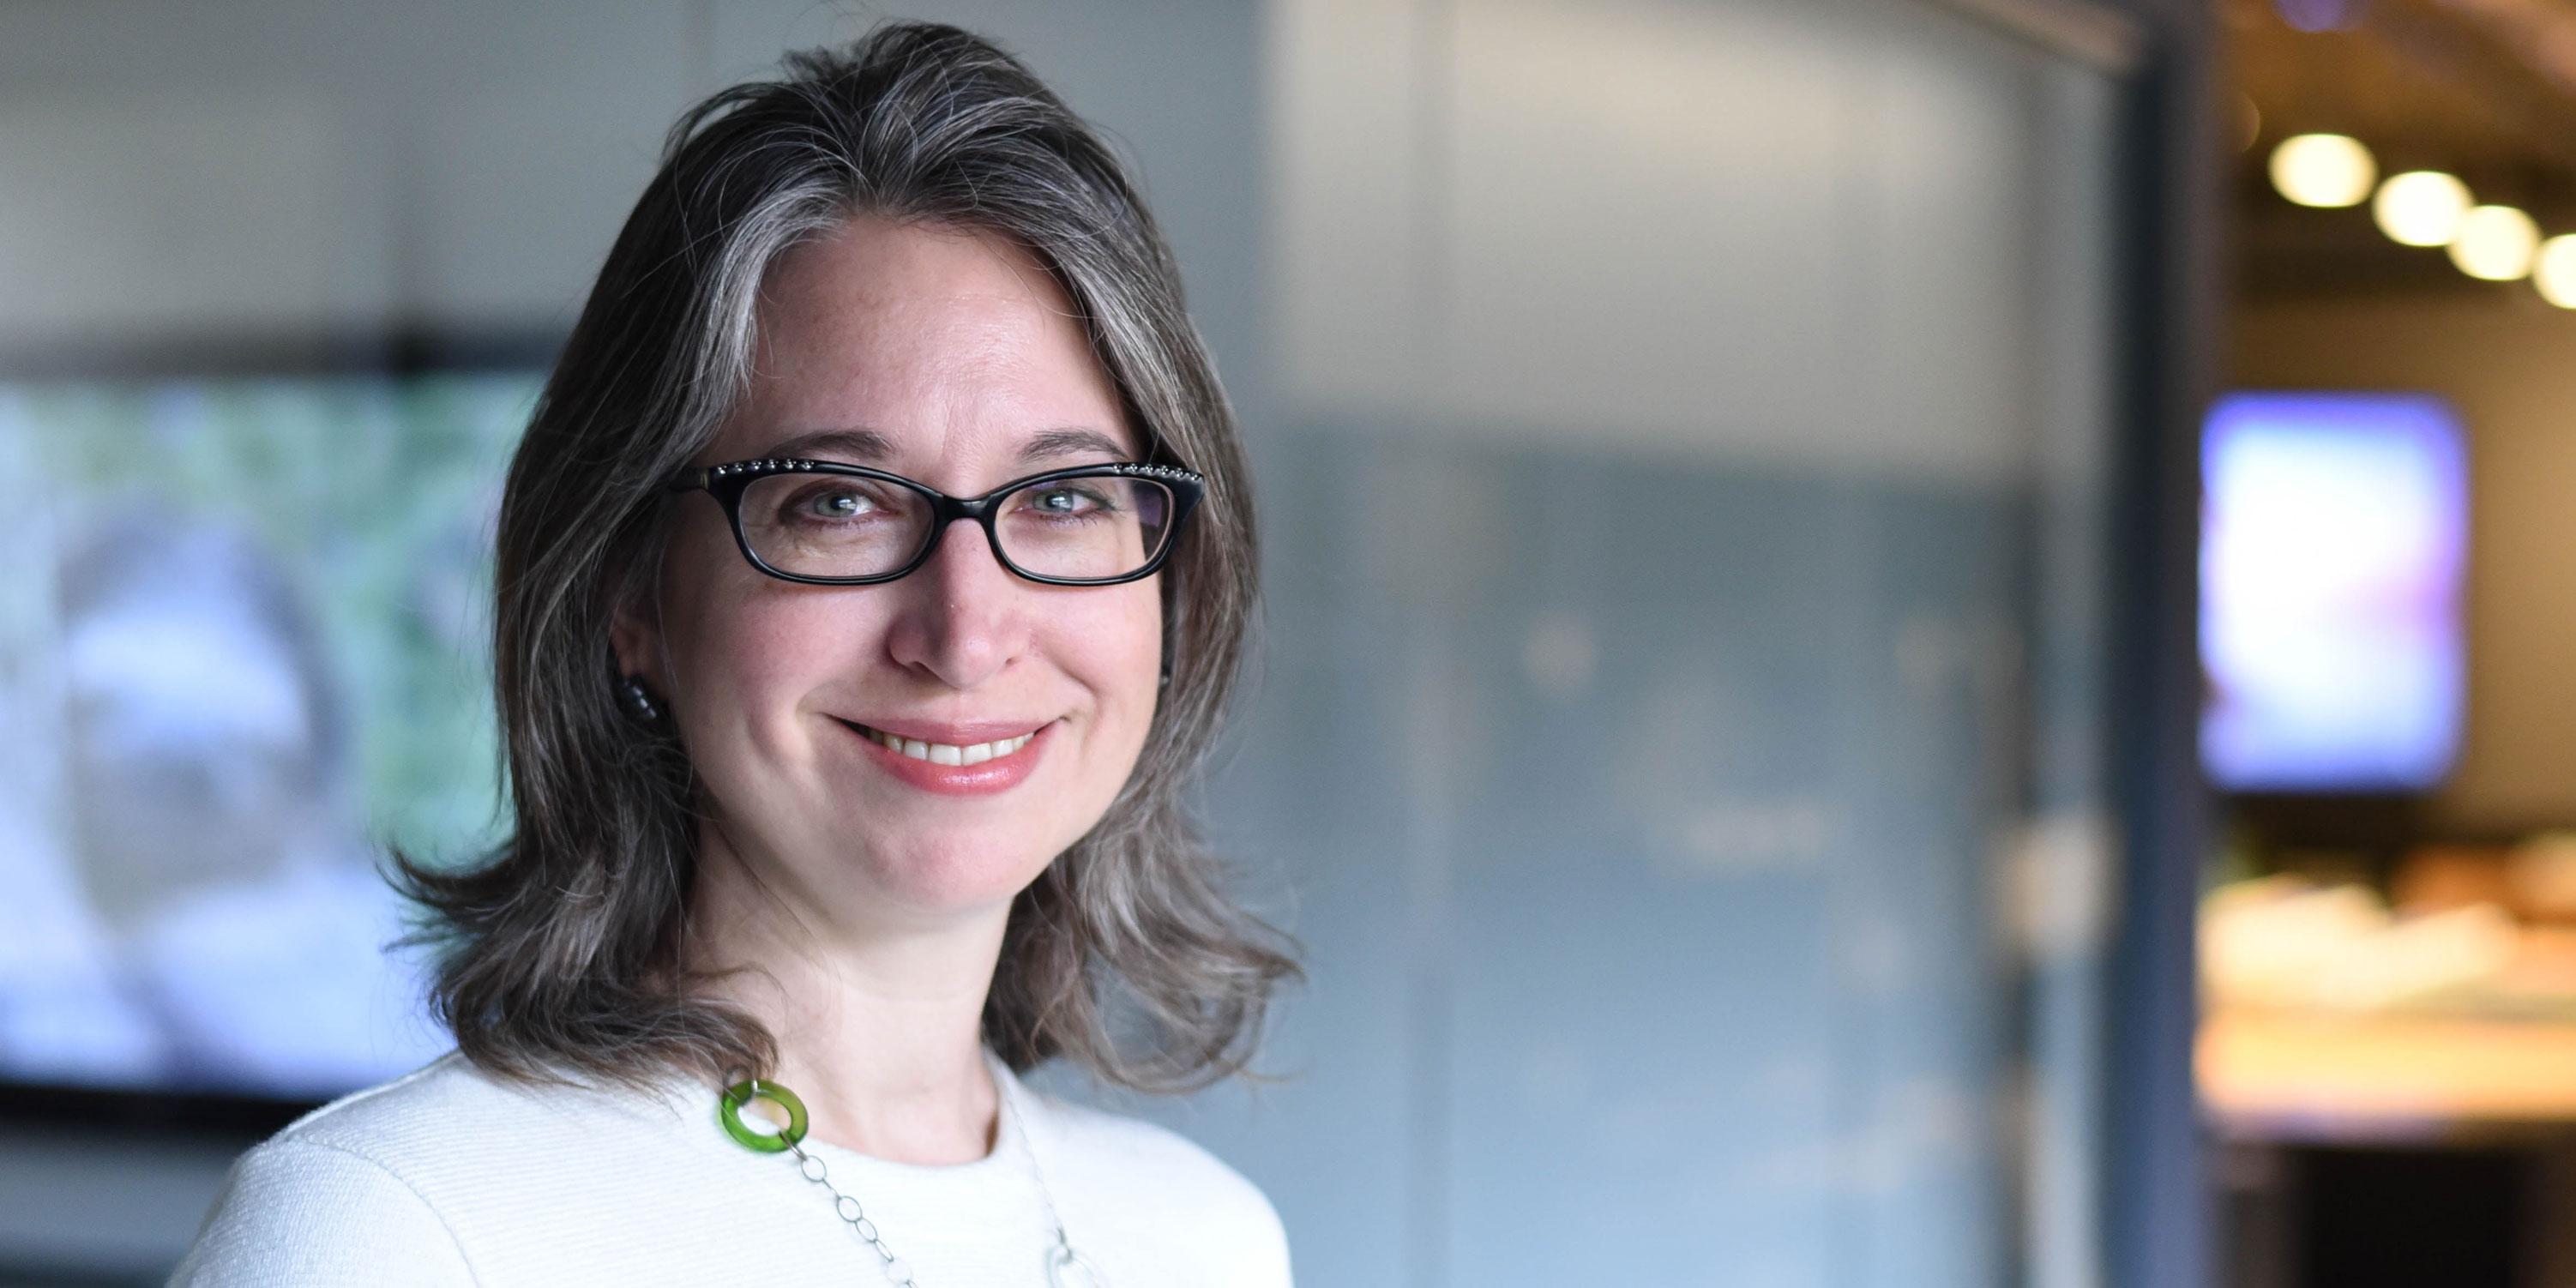 Christina Hoxie, AICP, Associate Principal, to direct BNIM's nationally recognized planning studio